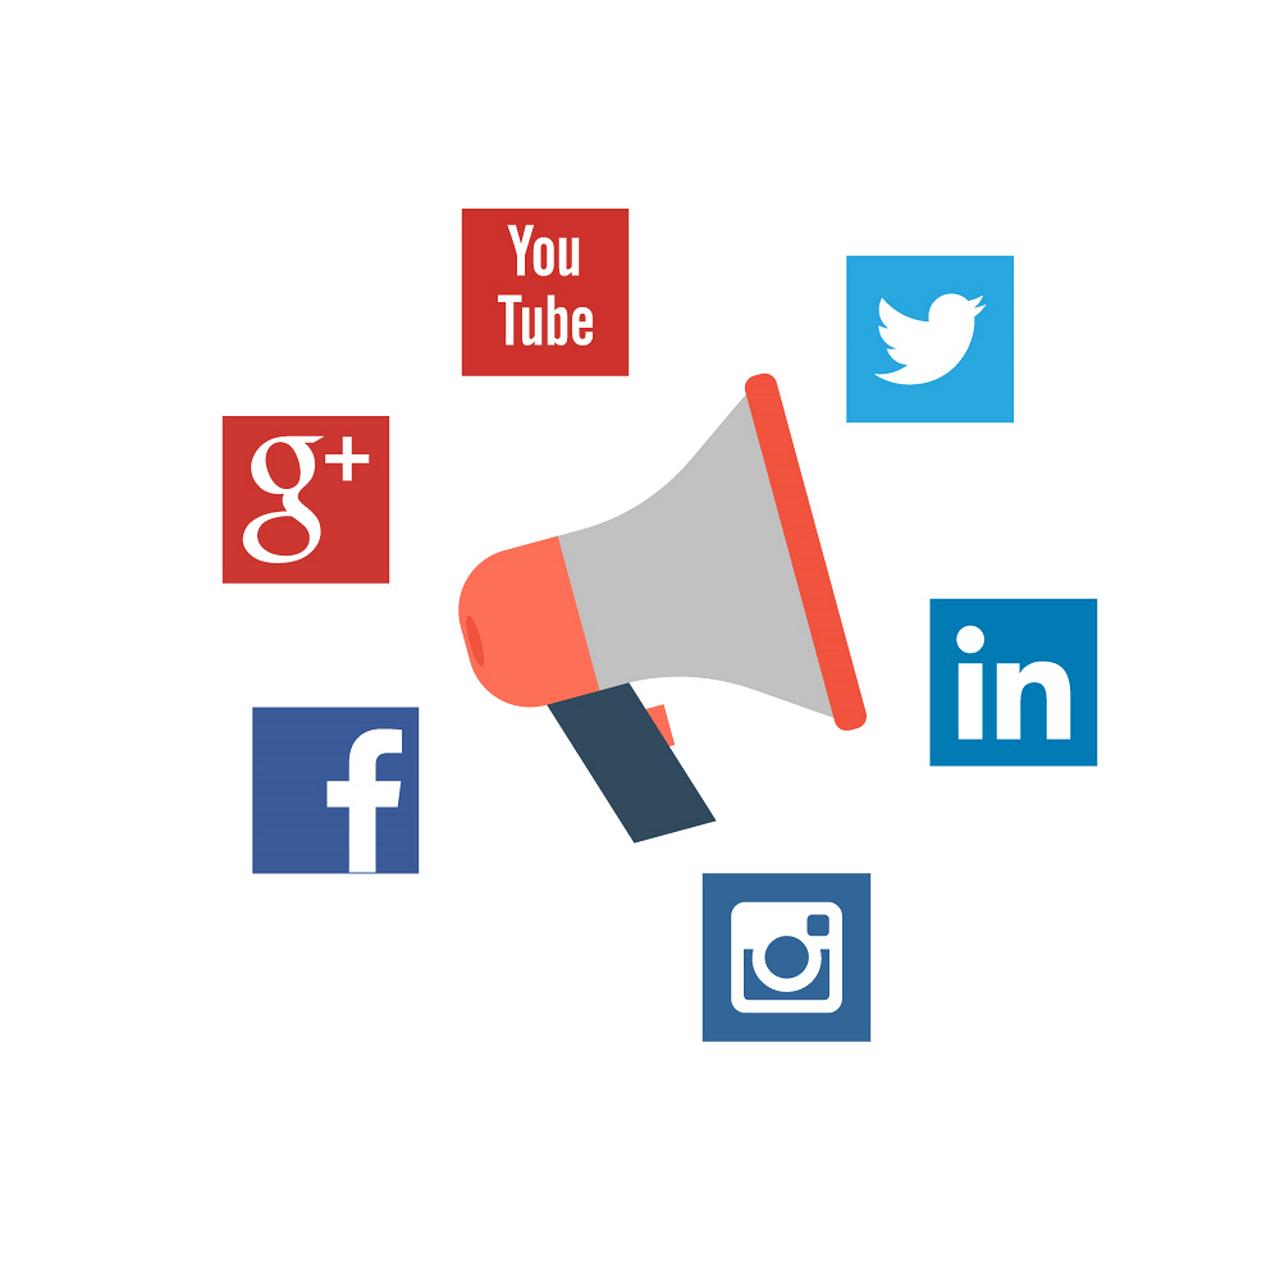 Social media marketing,seo,social,media,marketing - free image from needpix.com